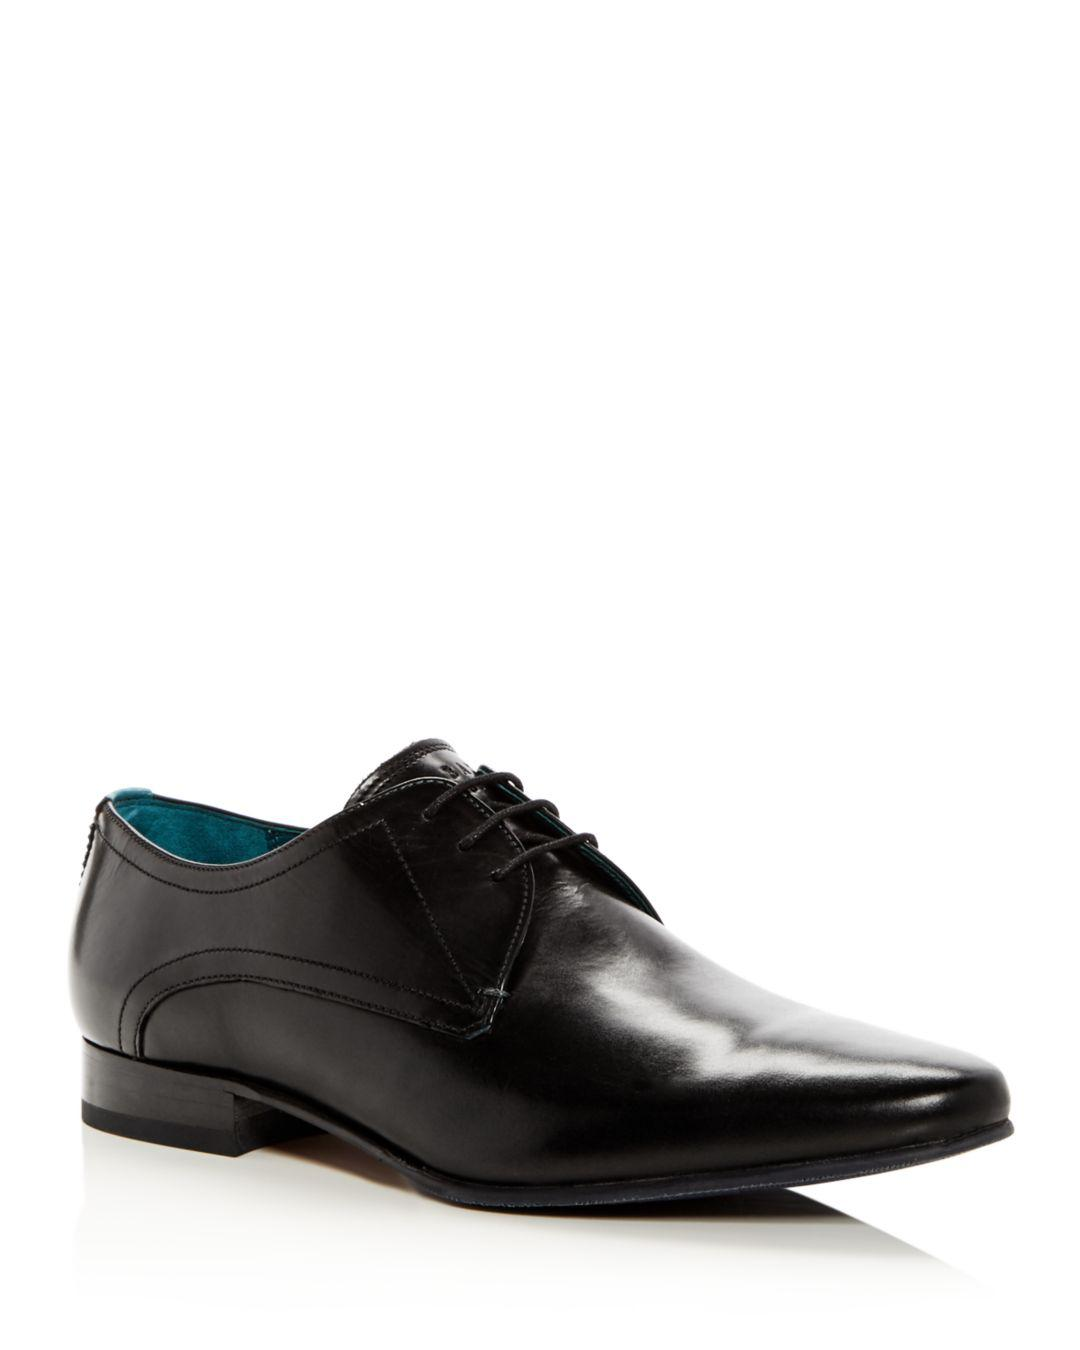 e8b29113ed6a49 Lyst - Ted Baker Men s Bhartli Leather Plain Toe Oxfords in Black ...